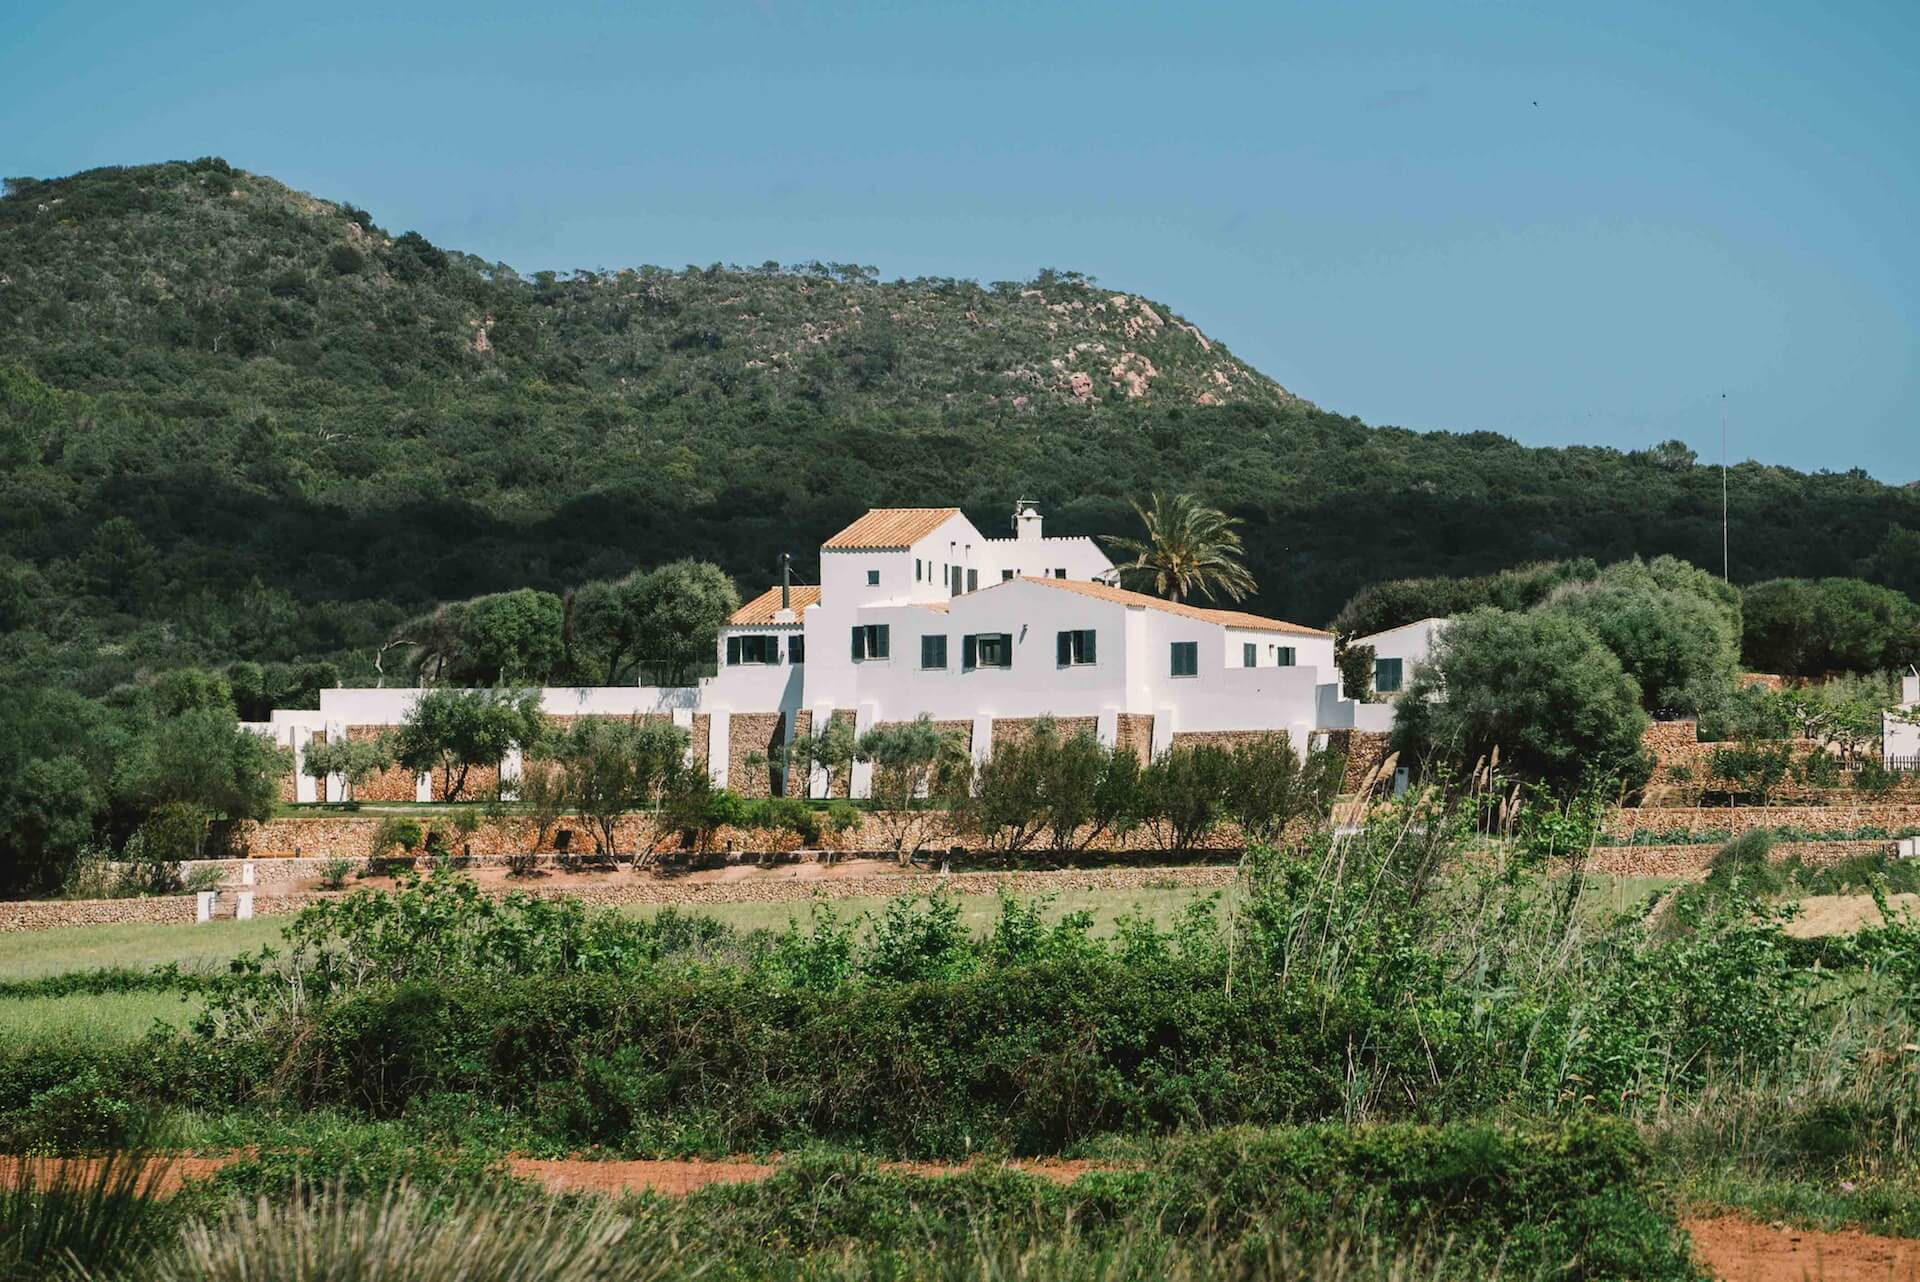 View of the farmhouse at Son Felip